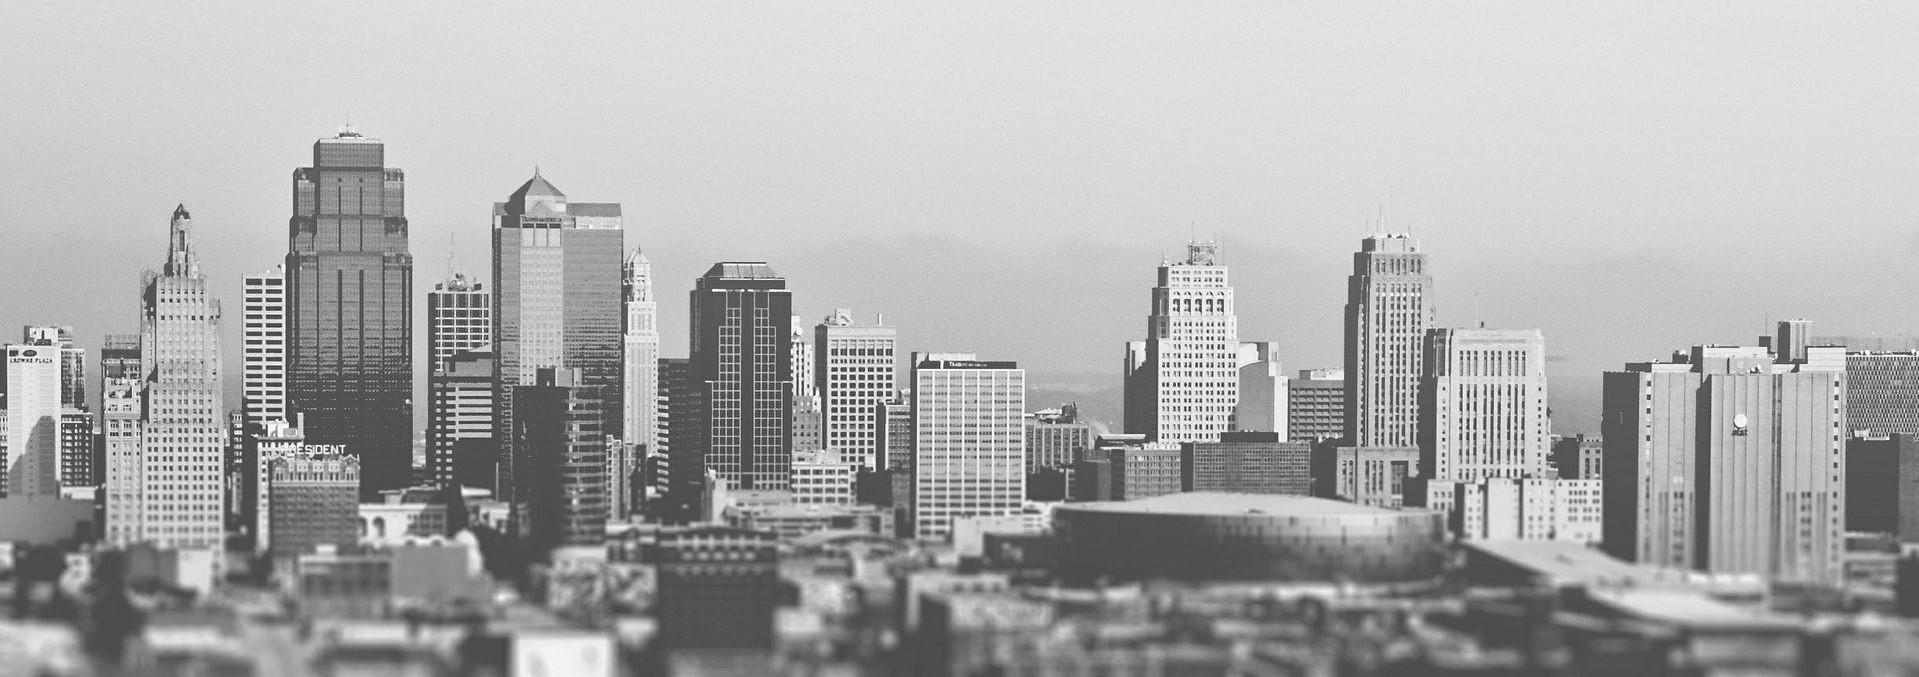 image showing skyscraper